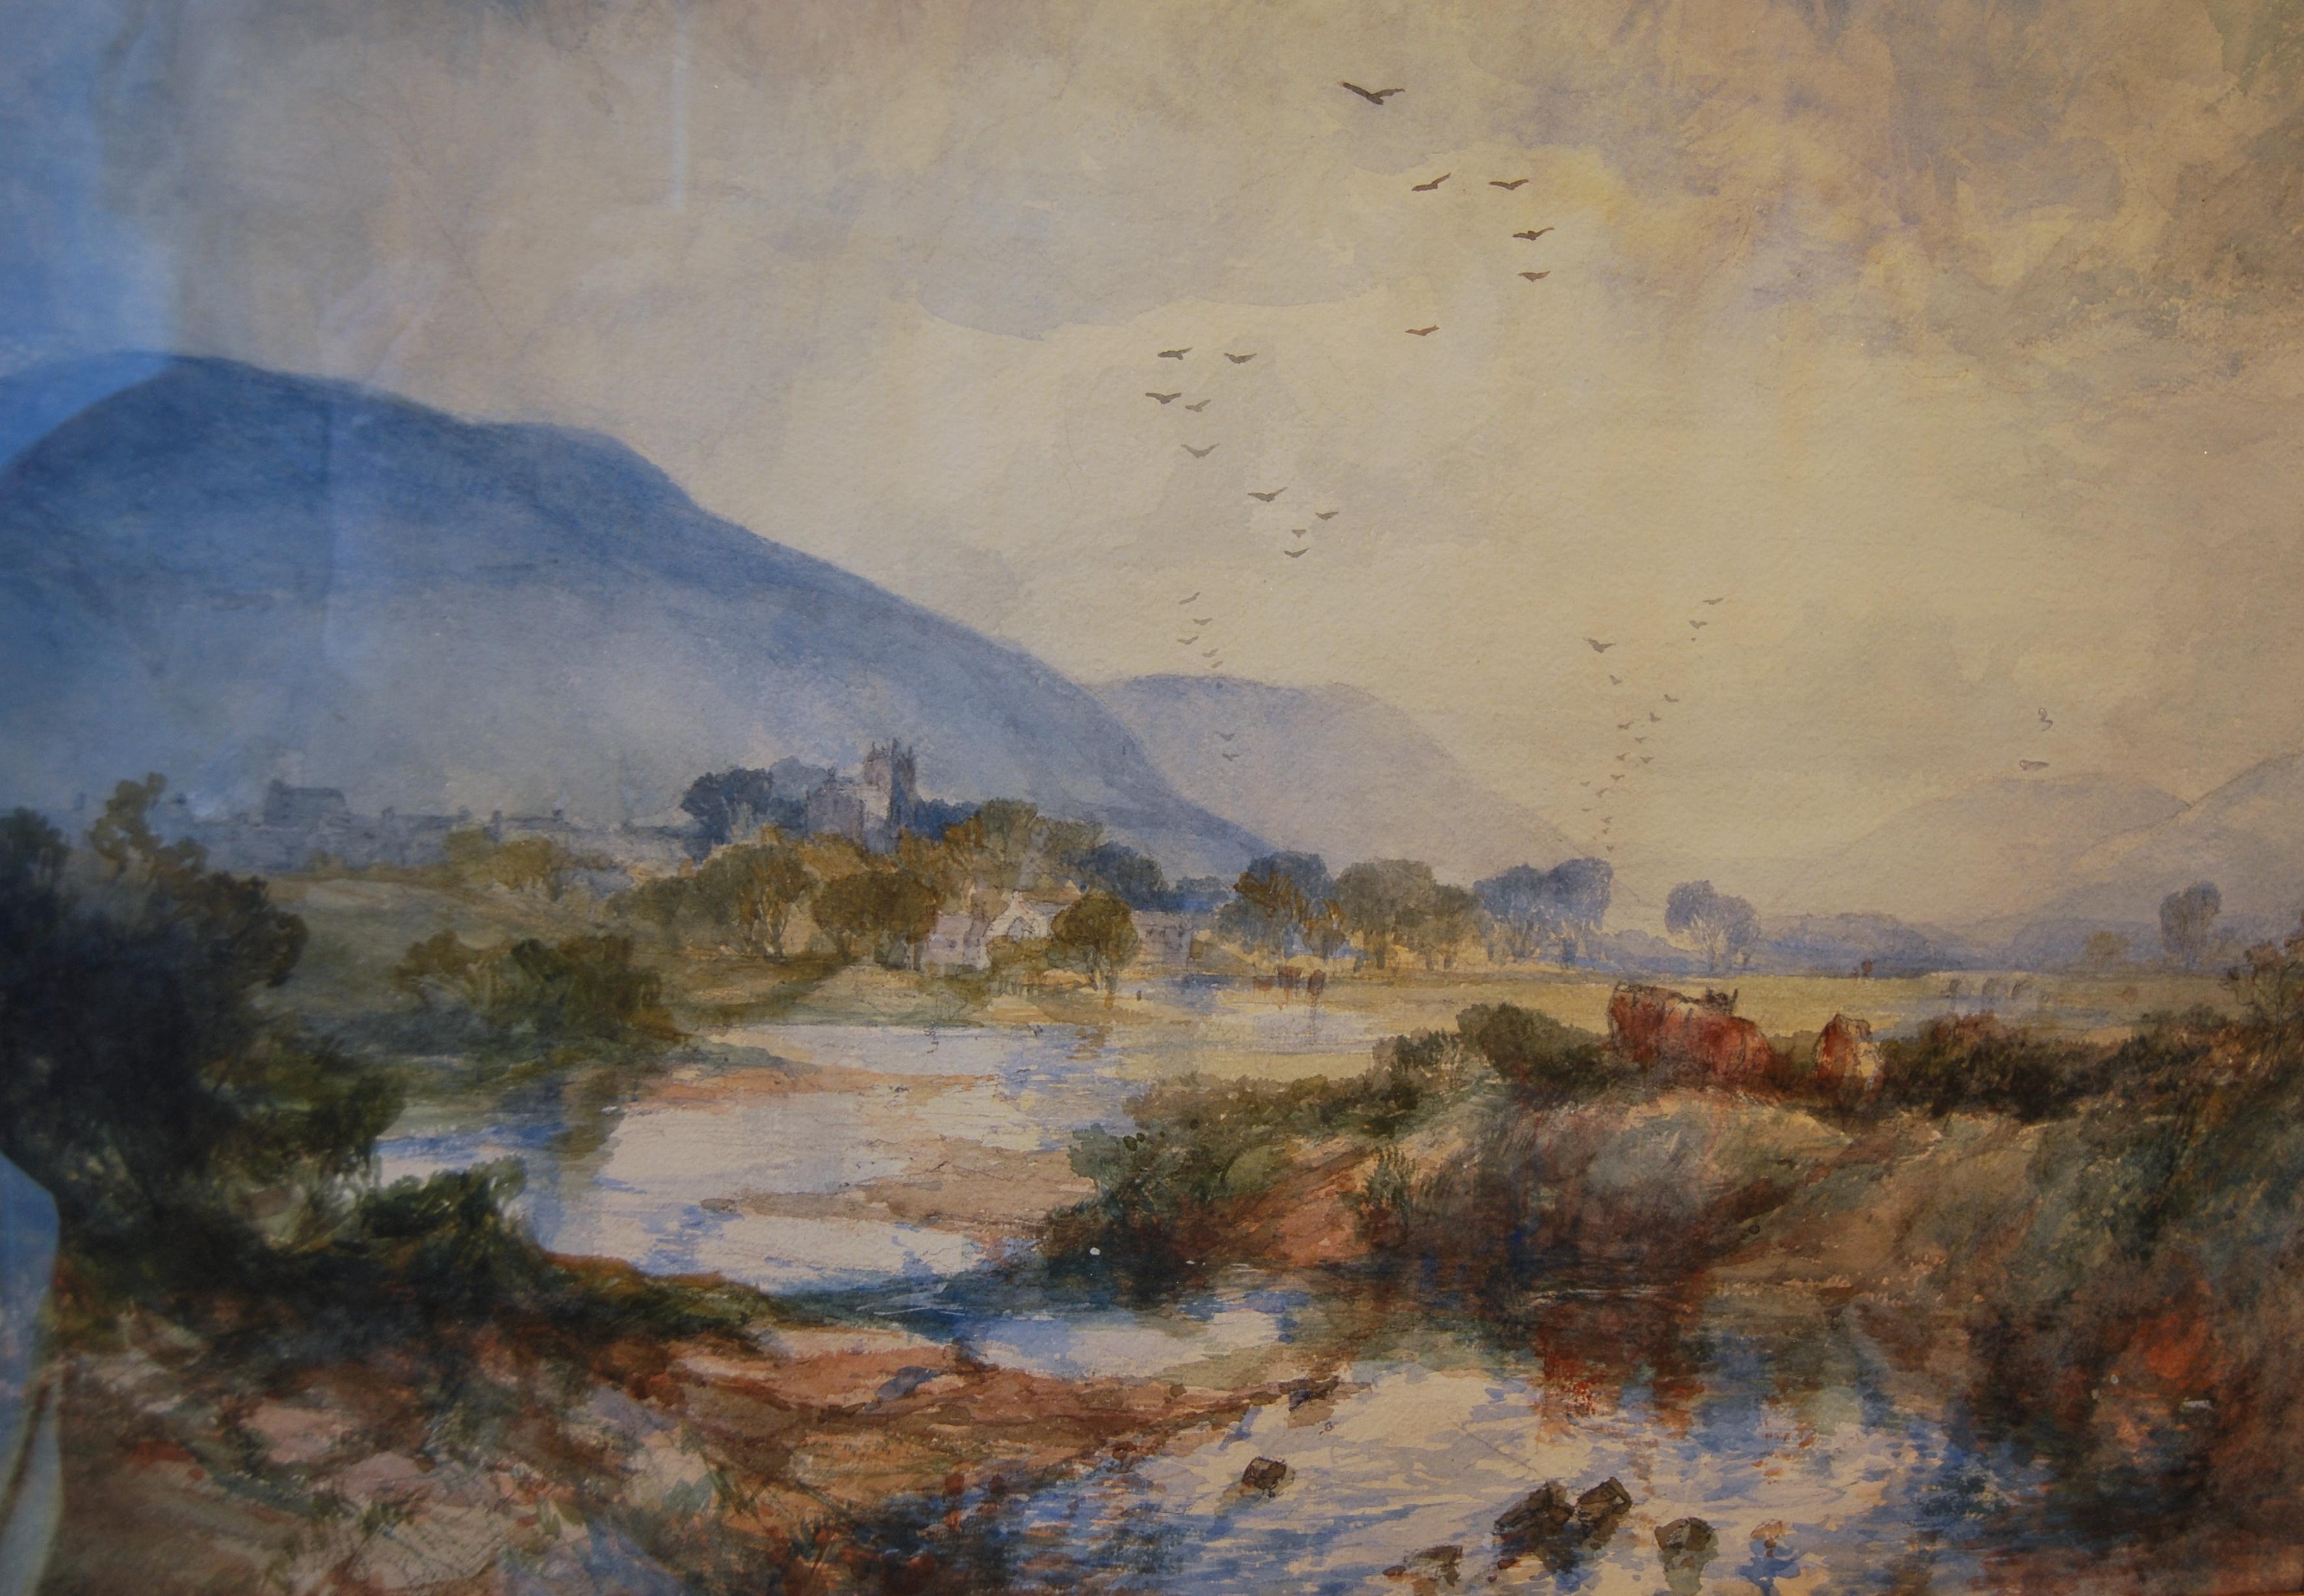 James Lawton Wingate